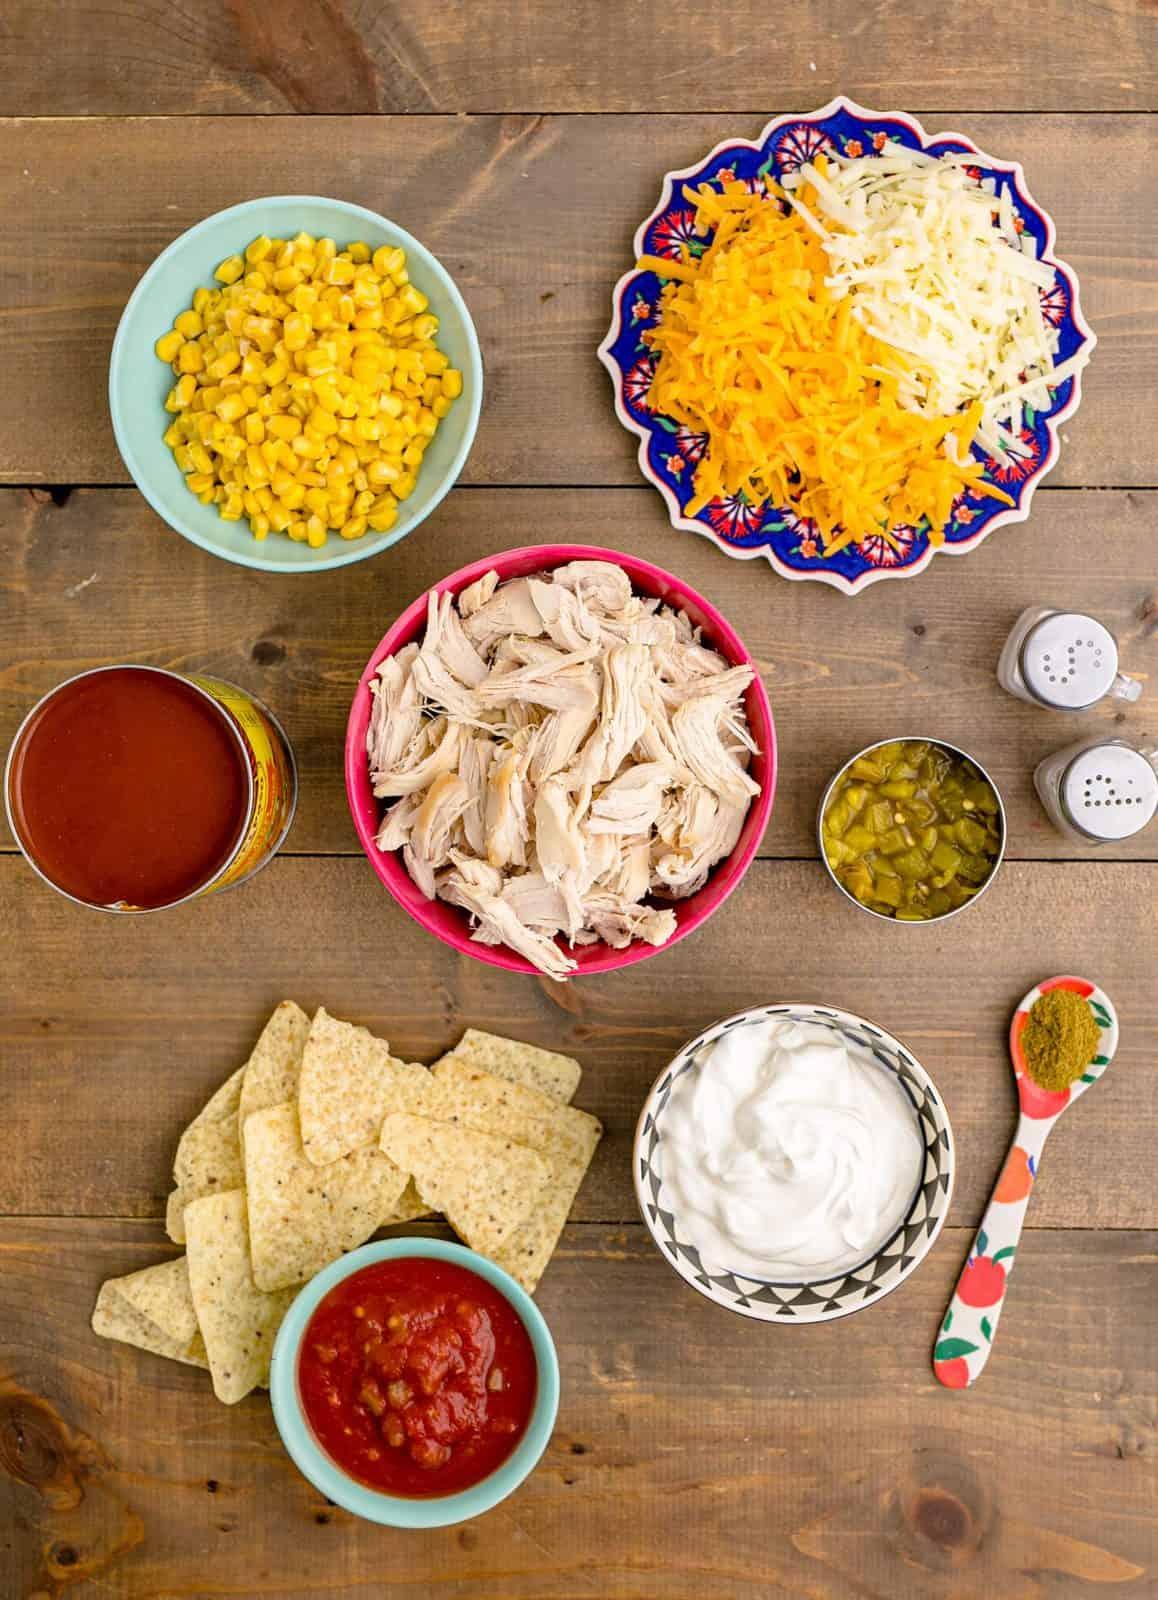 Ingredients needed: enchilada sauce green chilis, salsa, frozen corn, sour cream, cumin, salt, pepper, shredded chicken, tortilla chips, cheddar cheese, pepper jack cheese and optional garnishes.